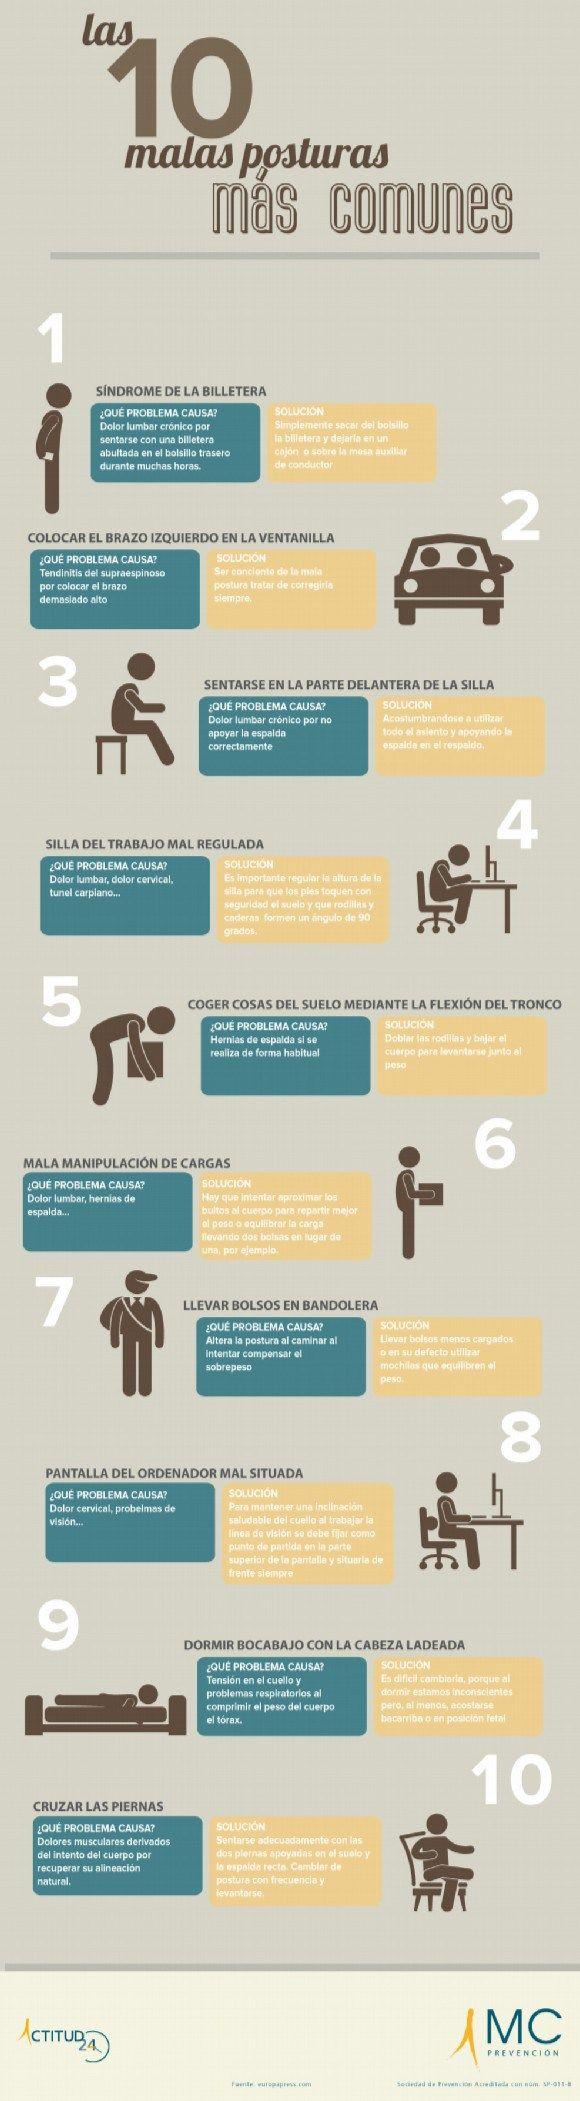 10 malas posturas más comunes #infografia #infographic #health